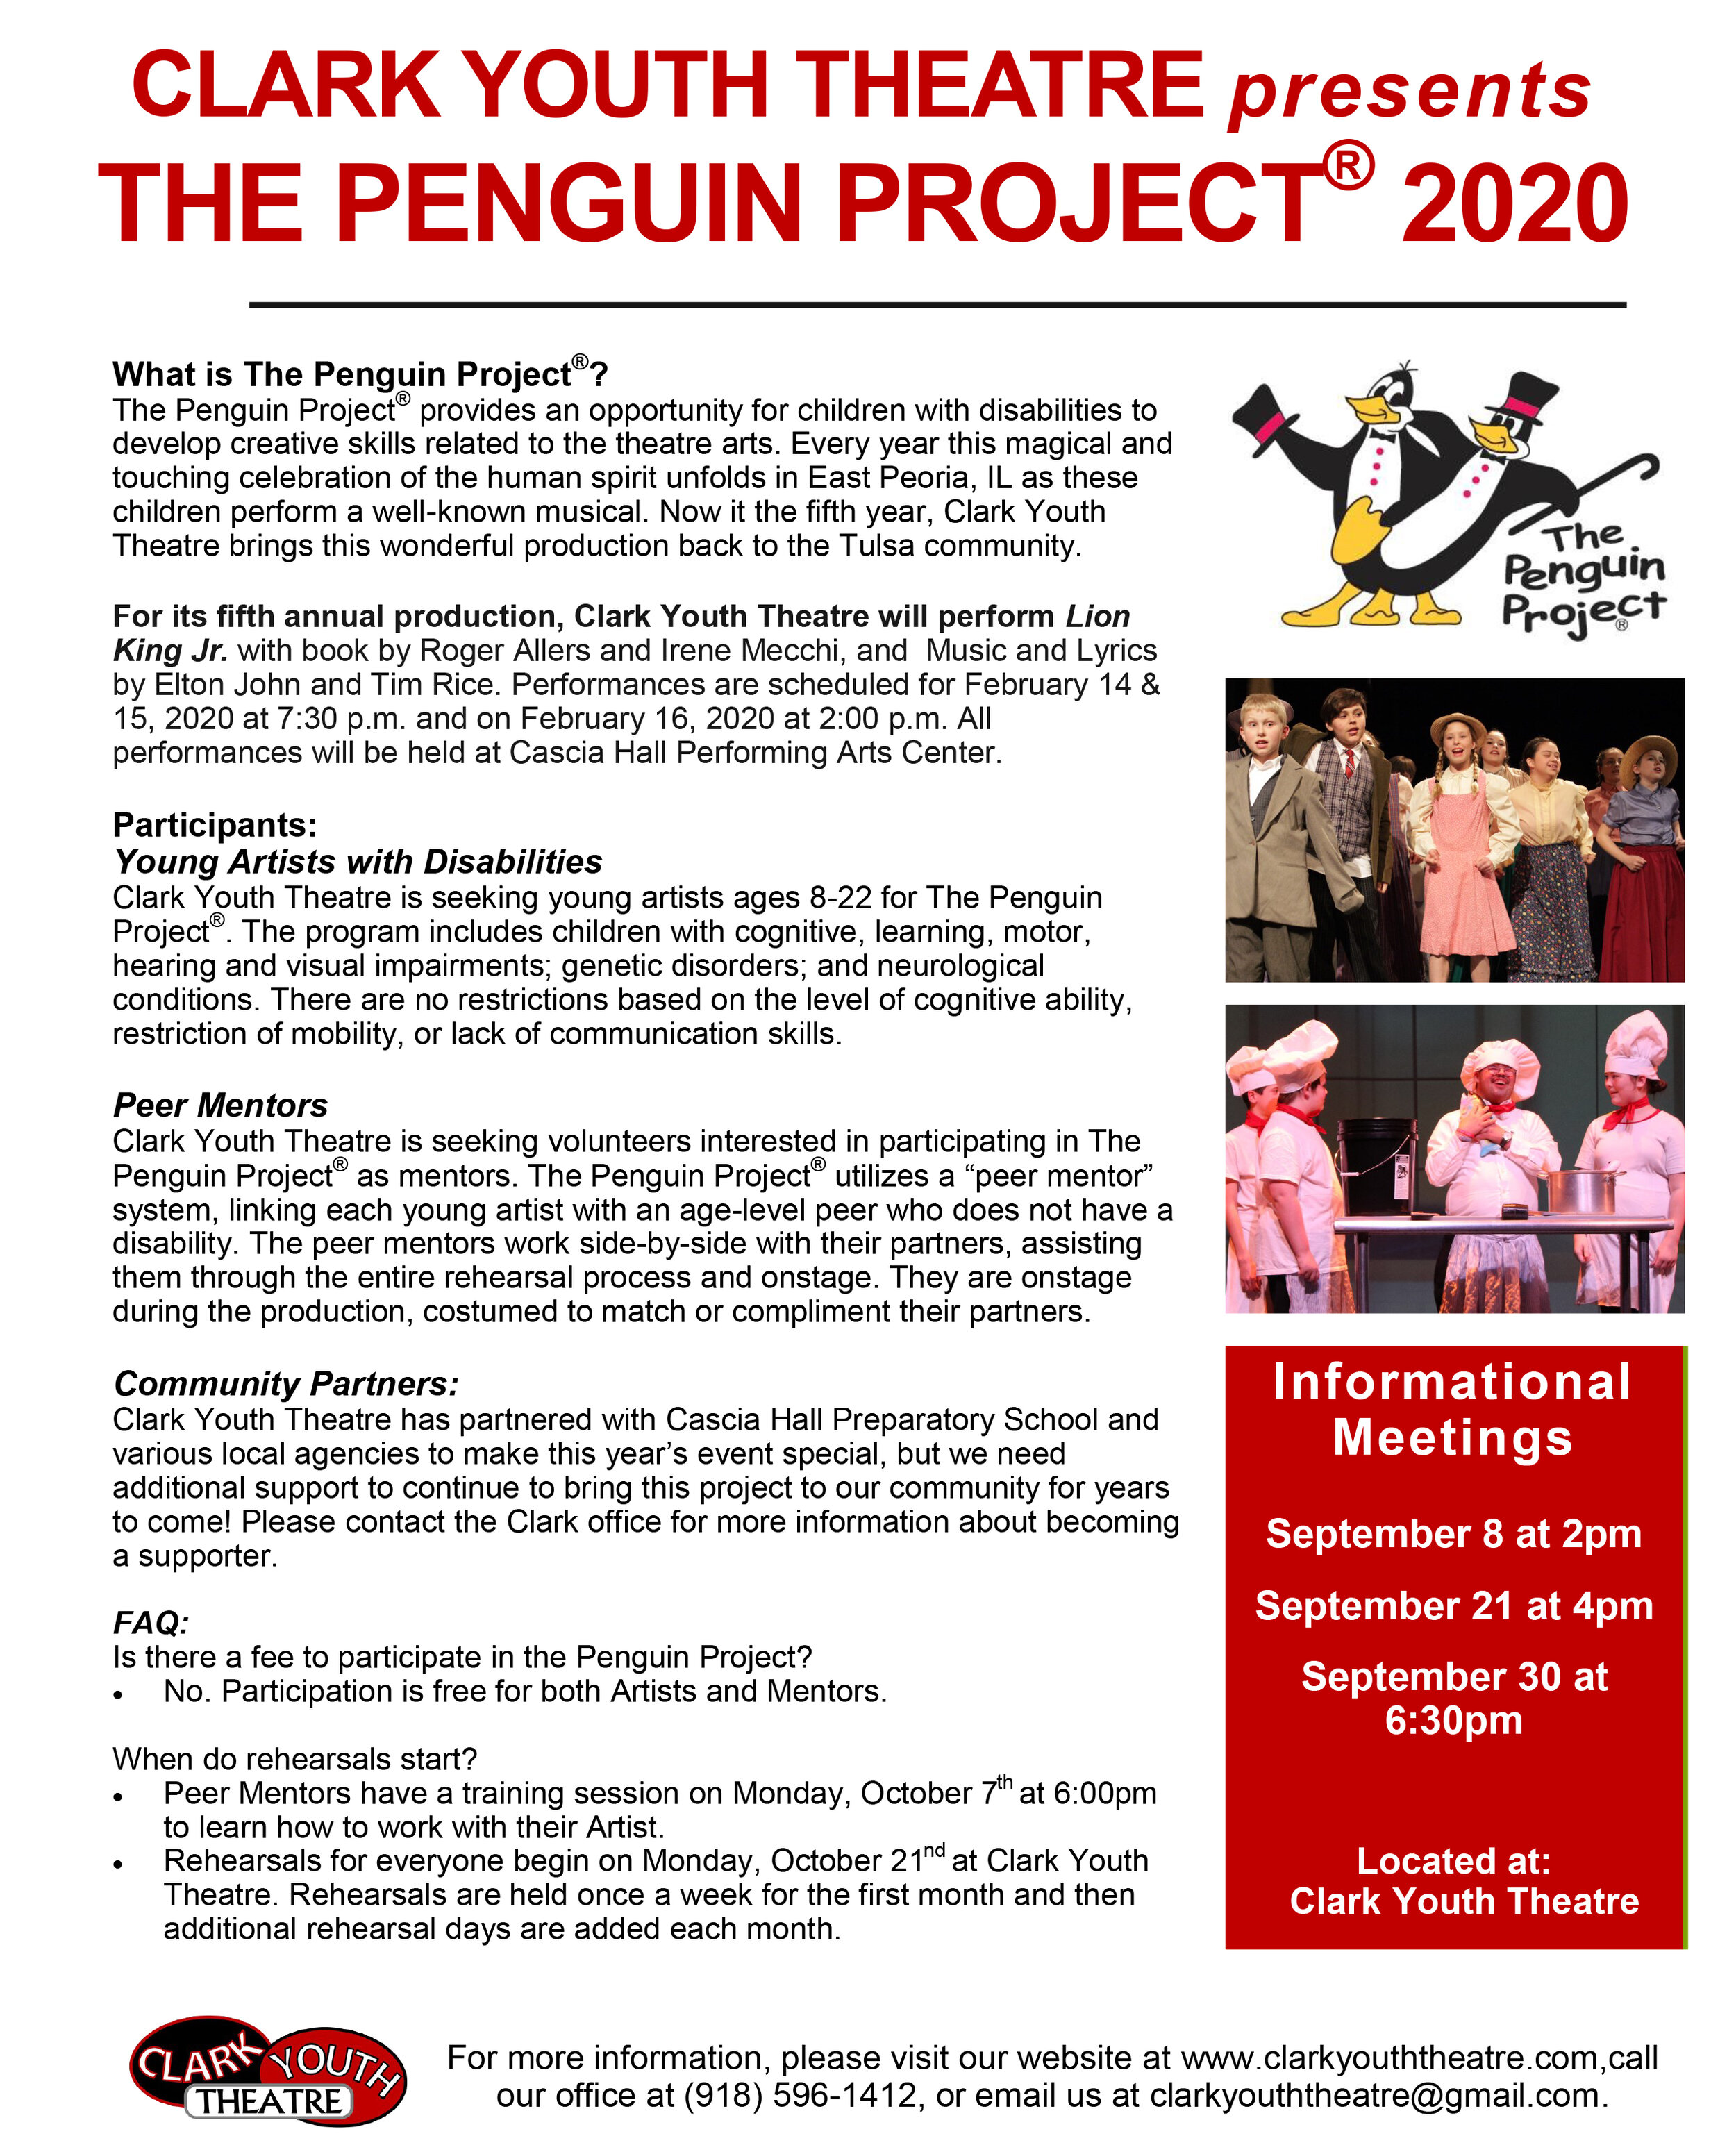 Clark Youth Theatre Penguin Project  Flyer 2020.jpg